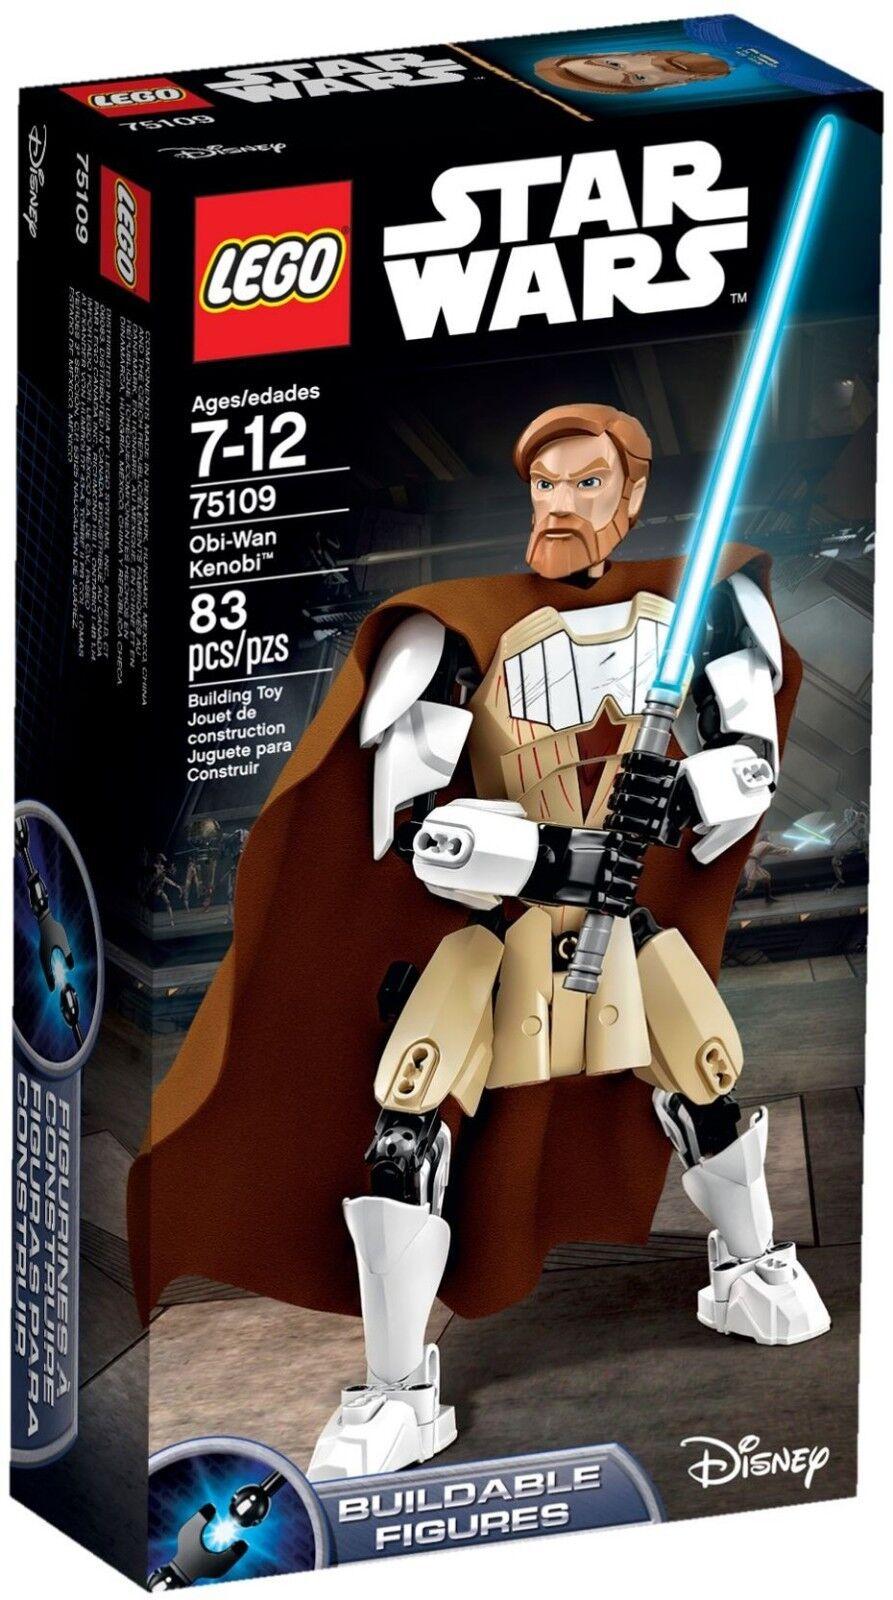 LEGO stjärnornas krig 75109 - Obi -Wan Kenobi - Byggbar figur - Ny i rutan